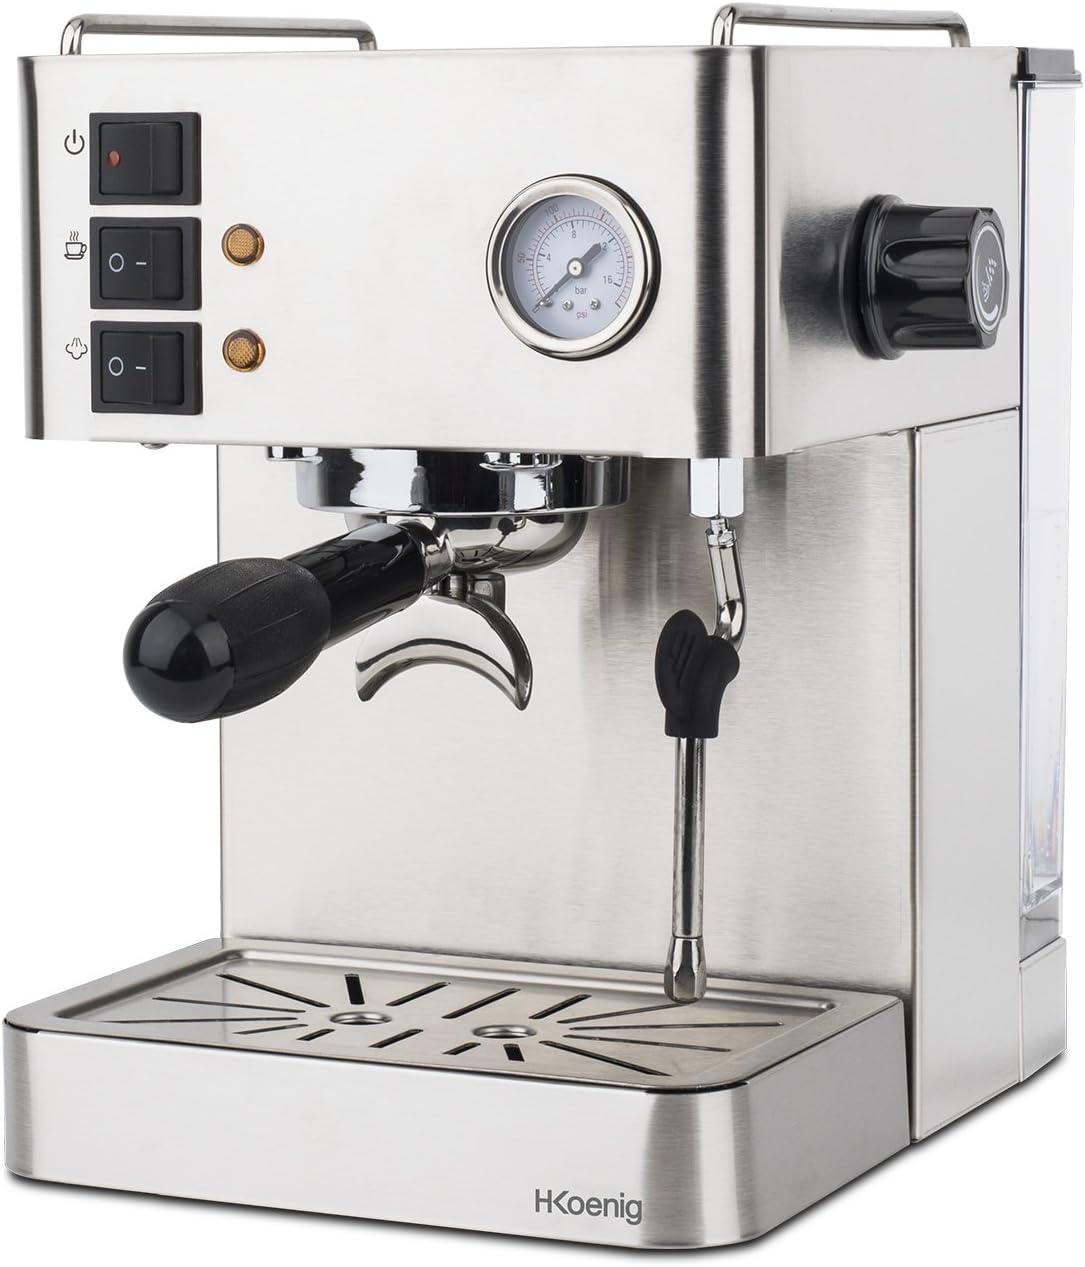 H.Koenig EXP530 Cafetera Express Espresso Profesional, 15 Bares, 1.7 L, 1450 W,Vaporizador Orientable, Doble Salida, Acero Inoxidable EXP350, 1.7 litros, Gris: Amazon.es: Hogar